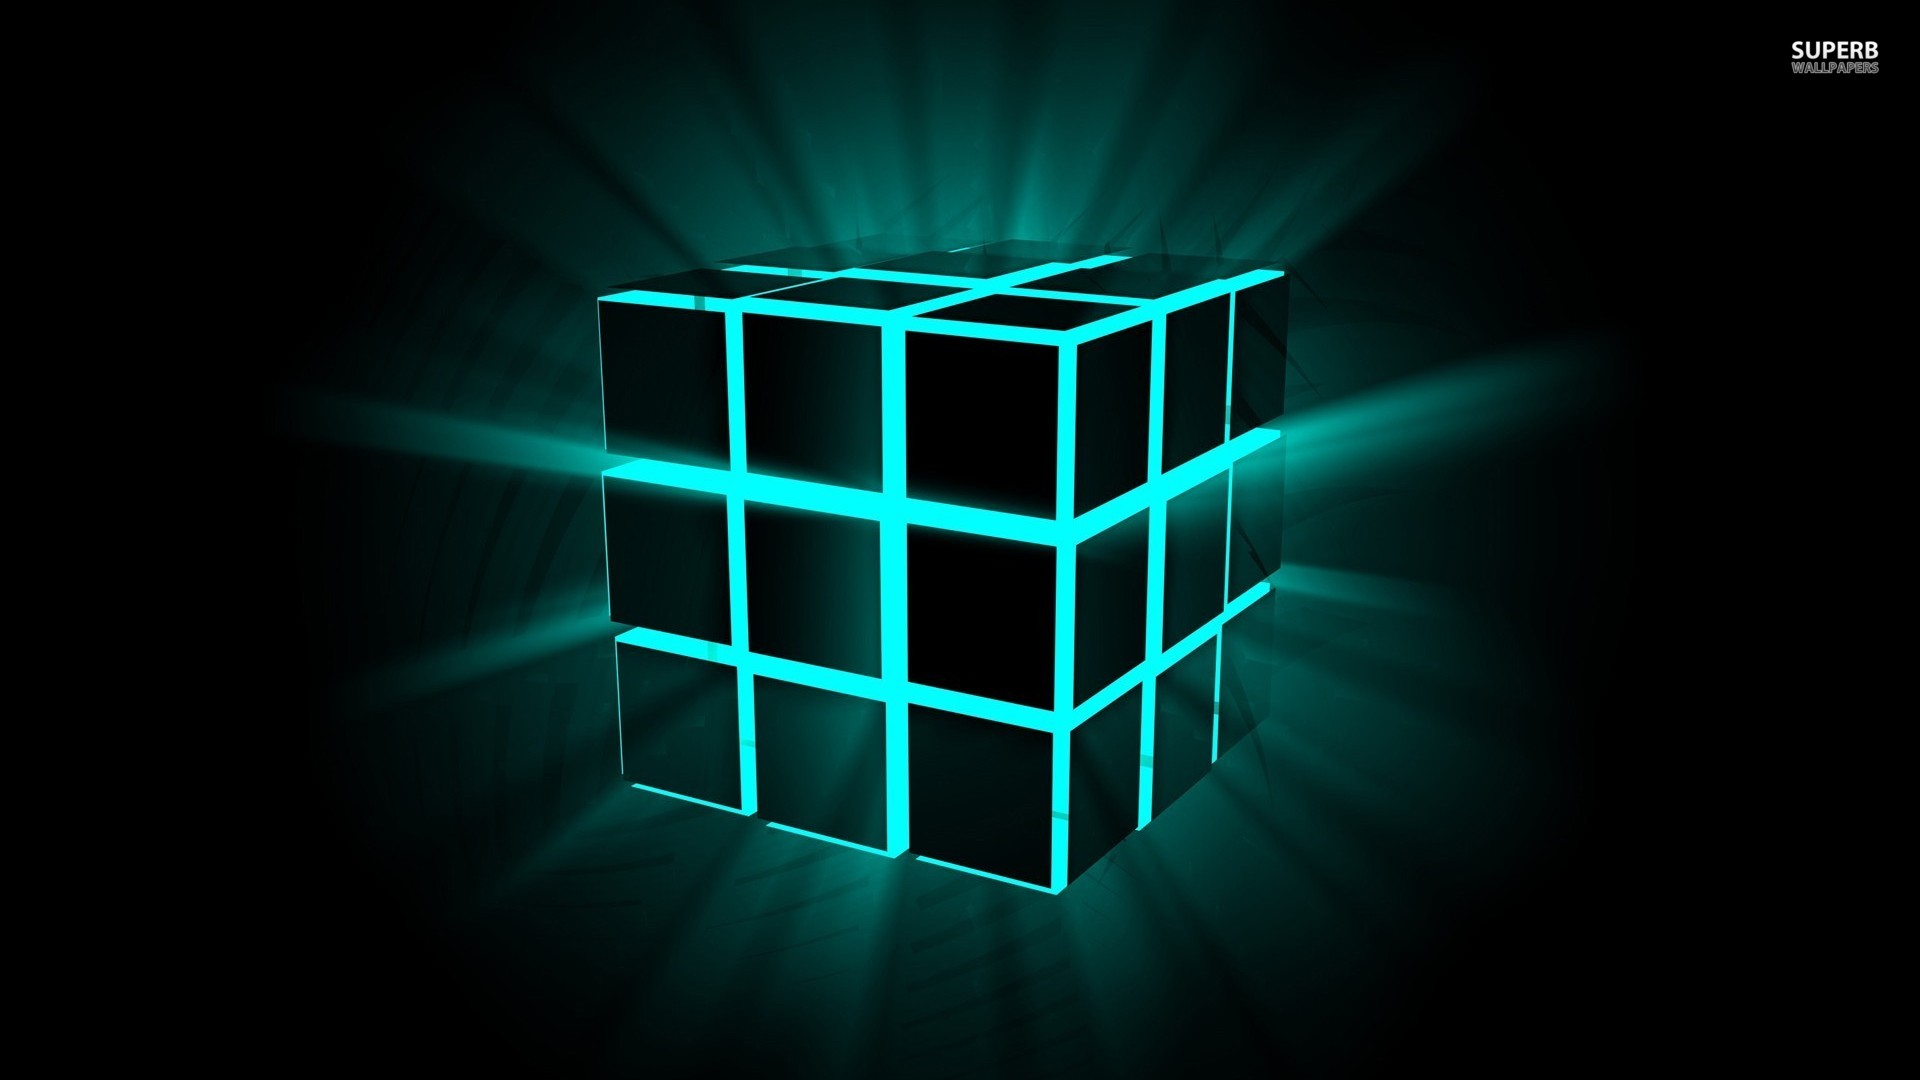 Neon cube wallpaper 1920x1080